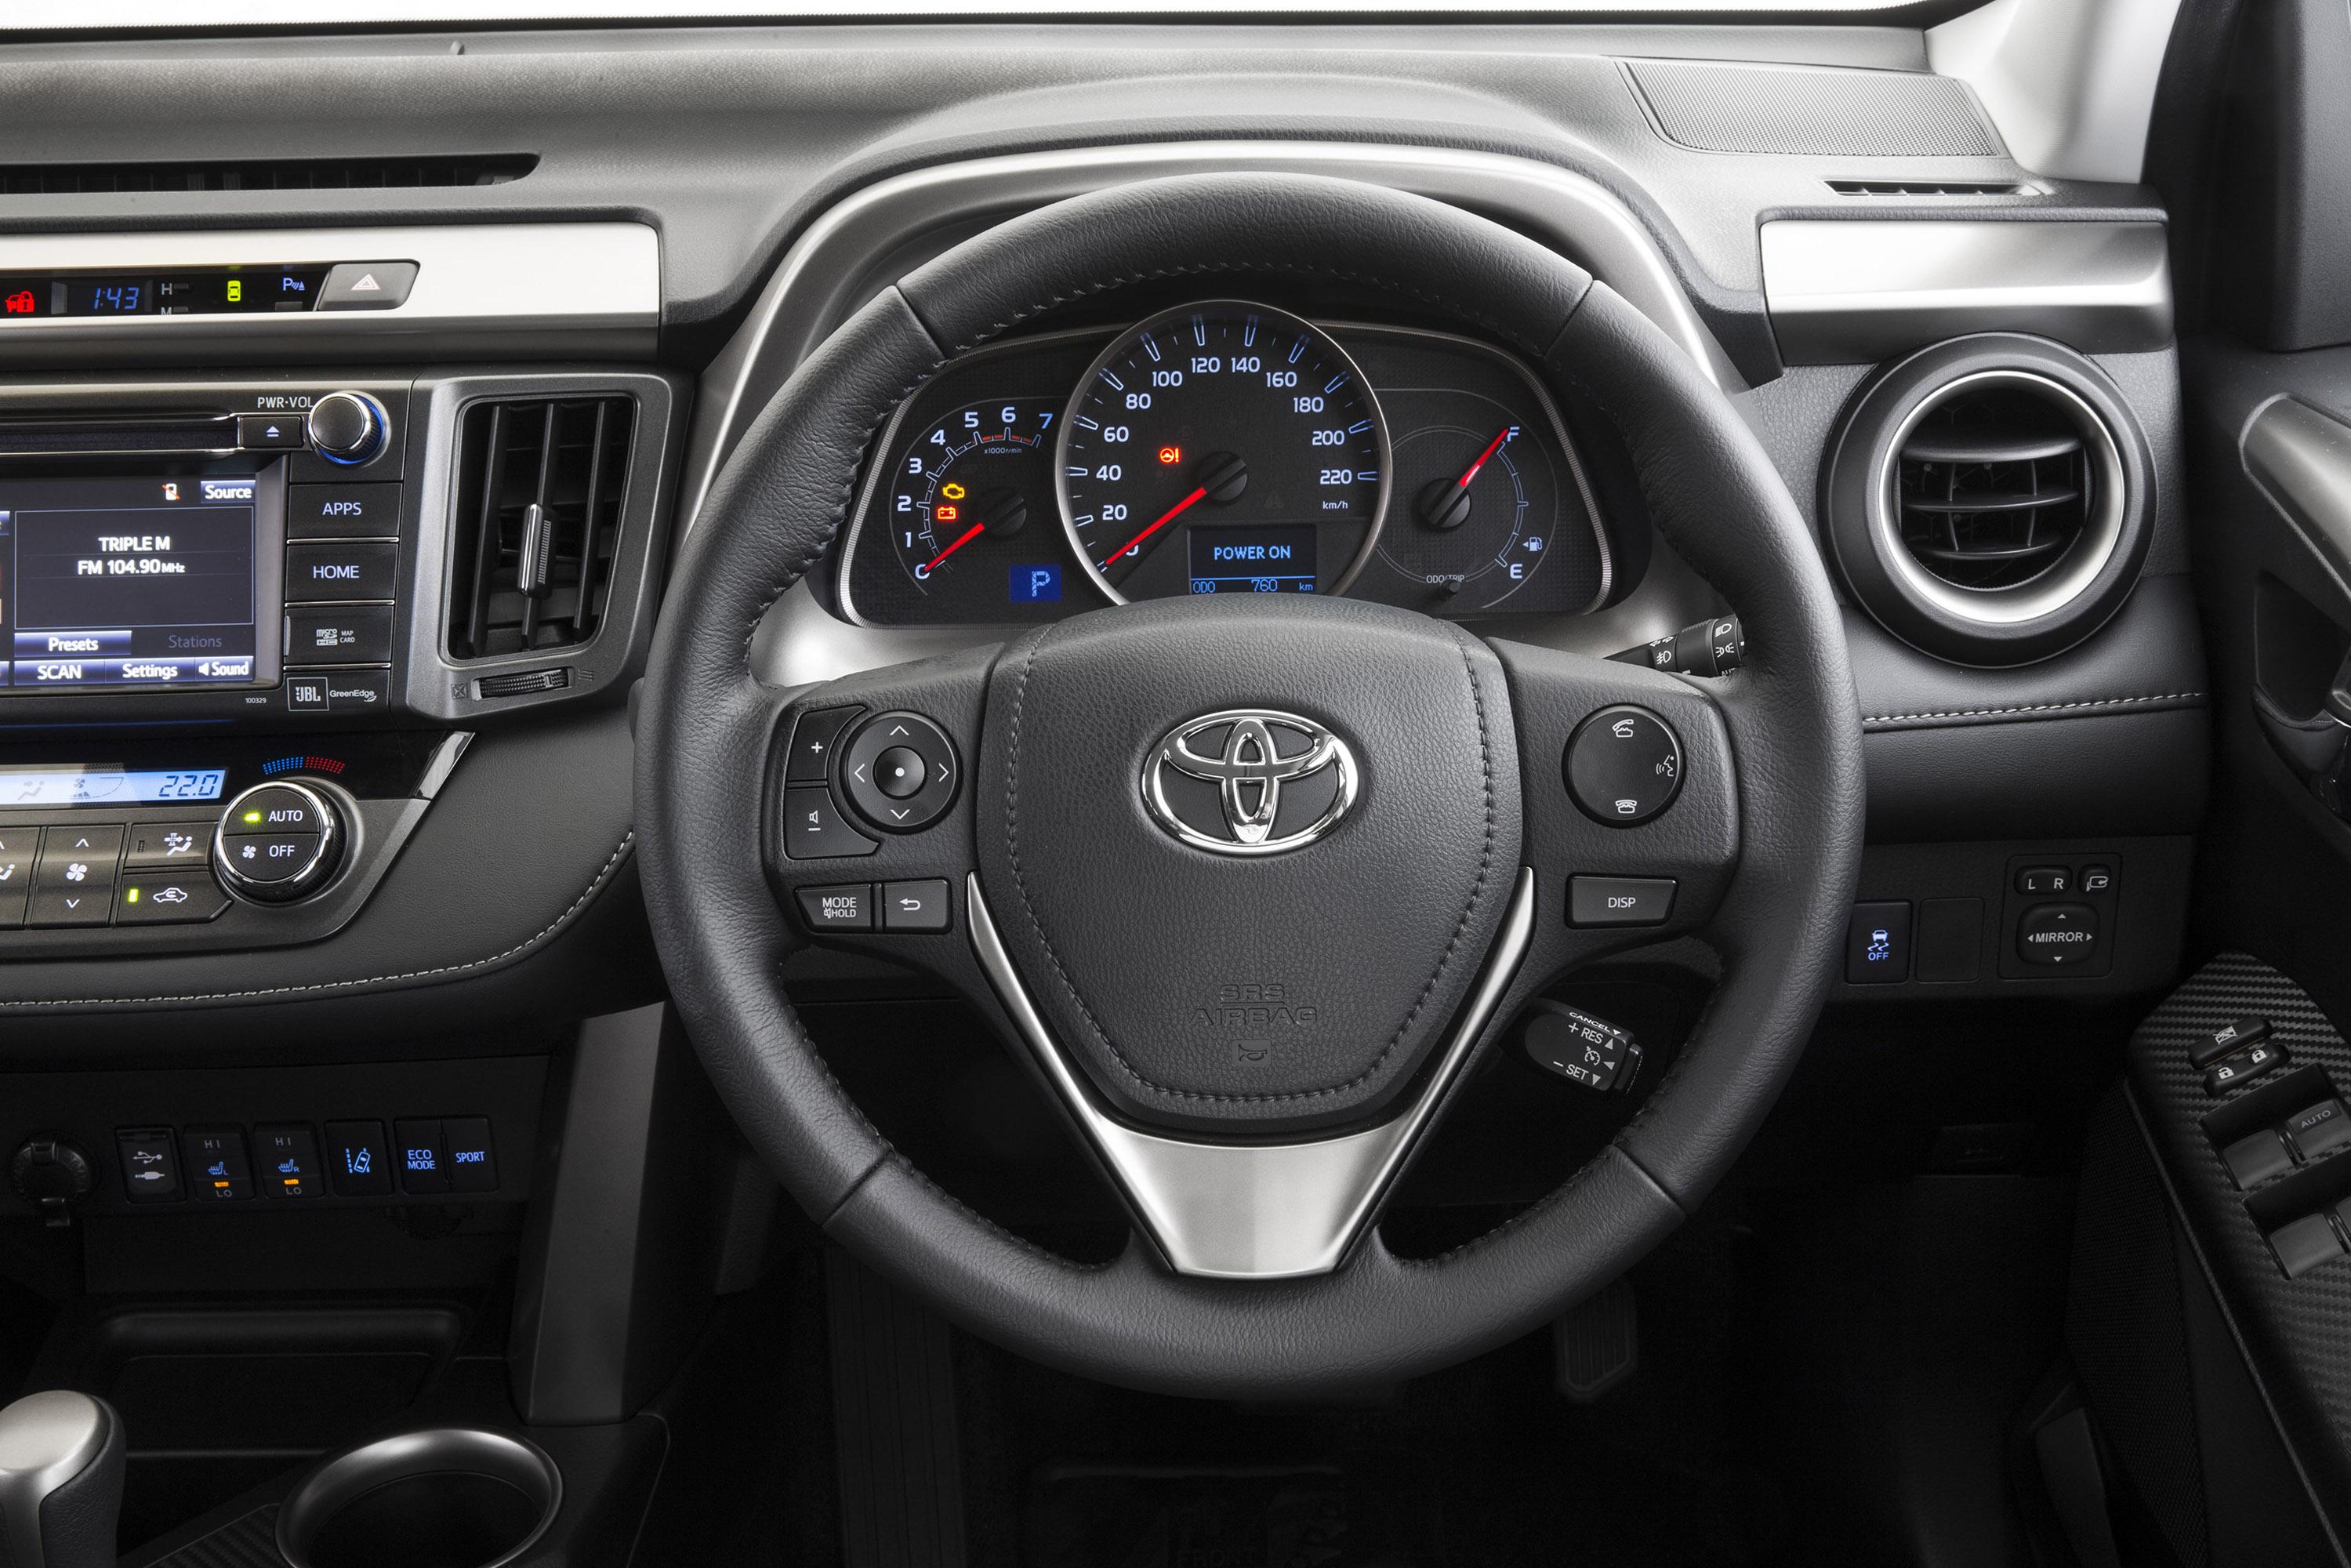 Toyota rav4 cruiser 2014